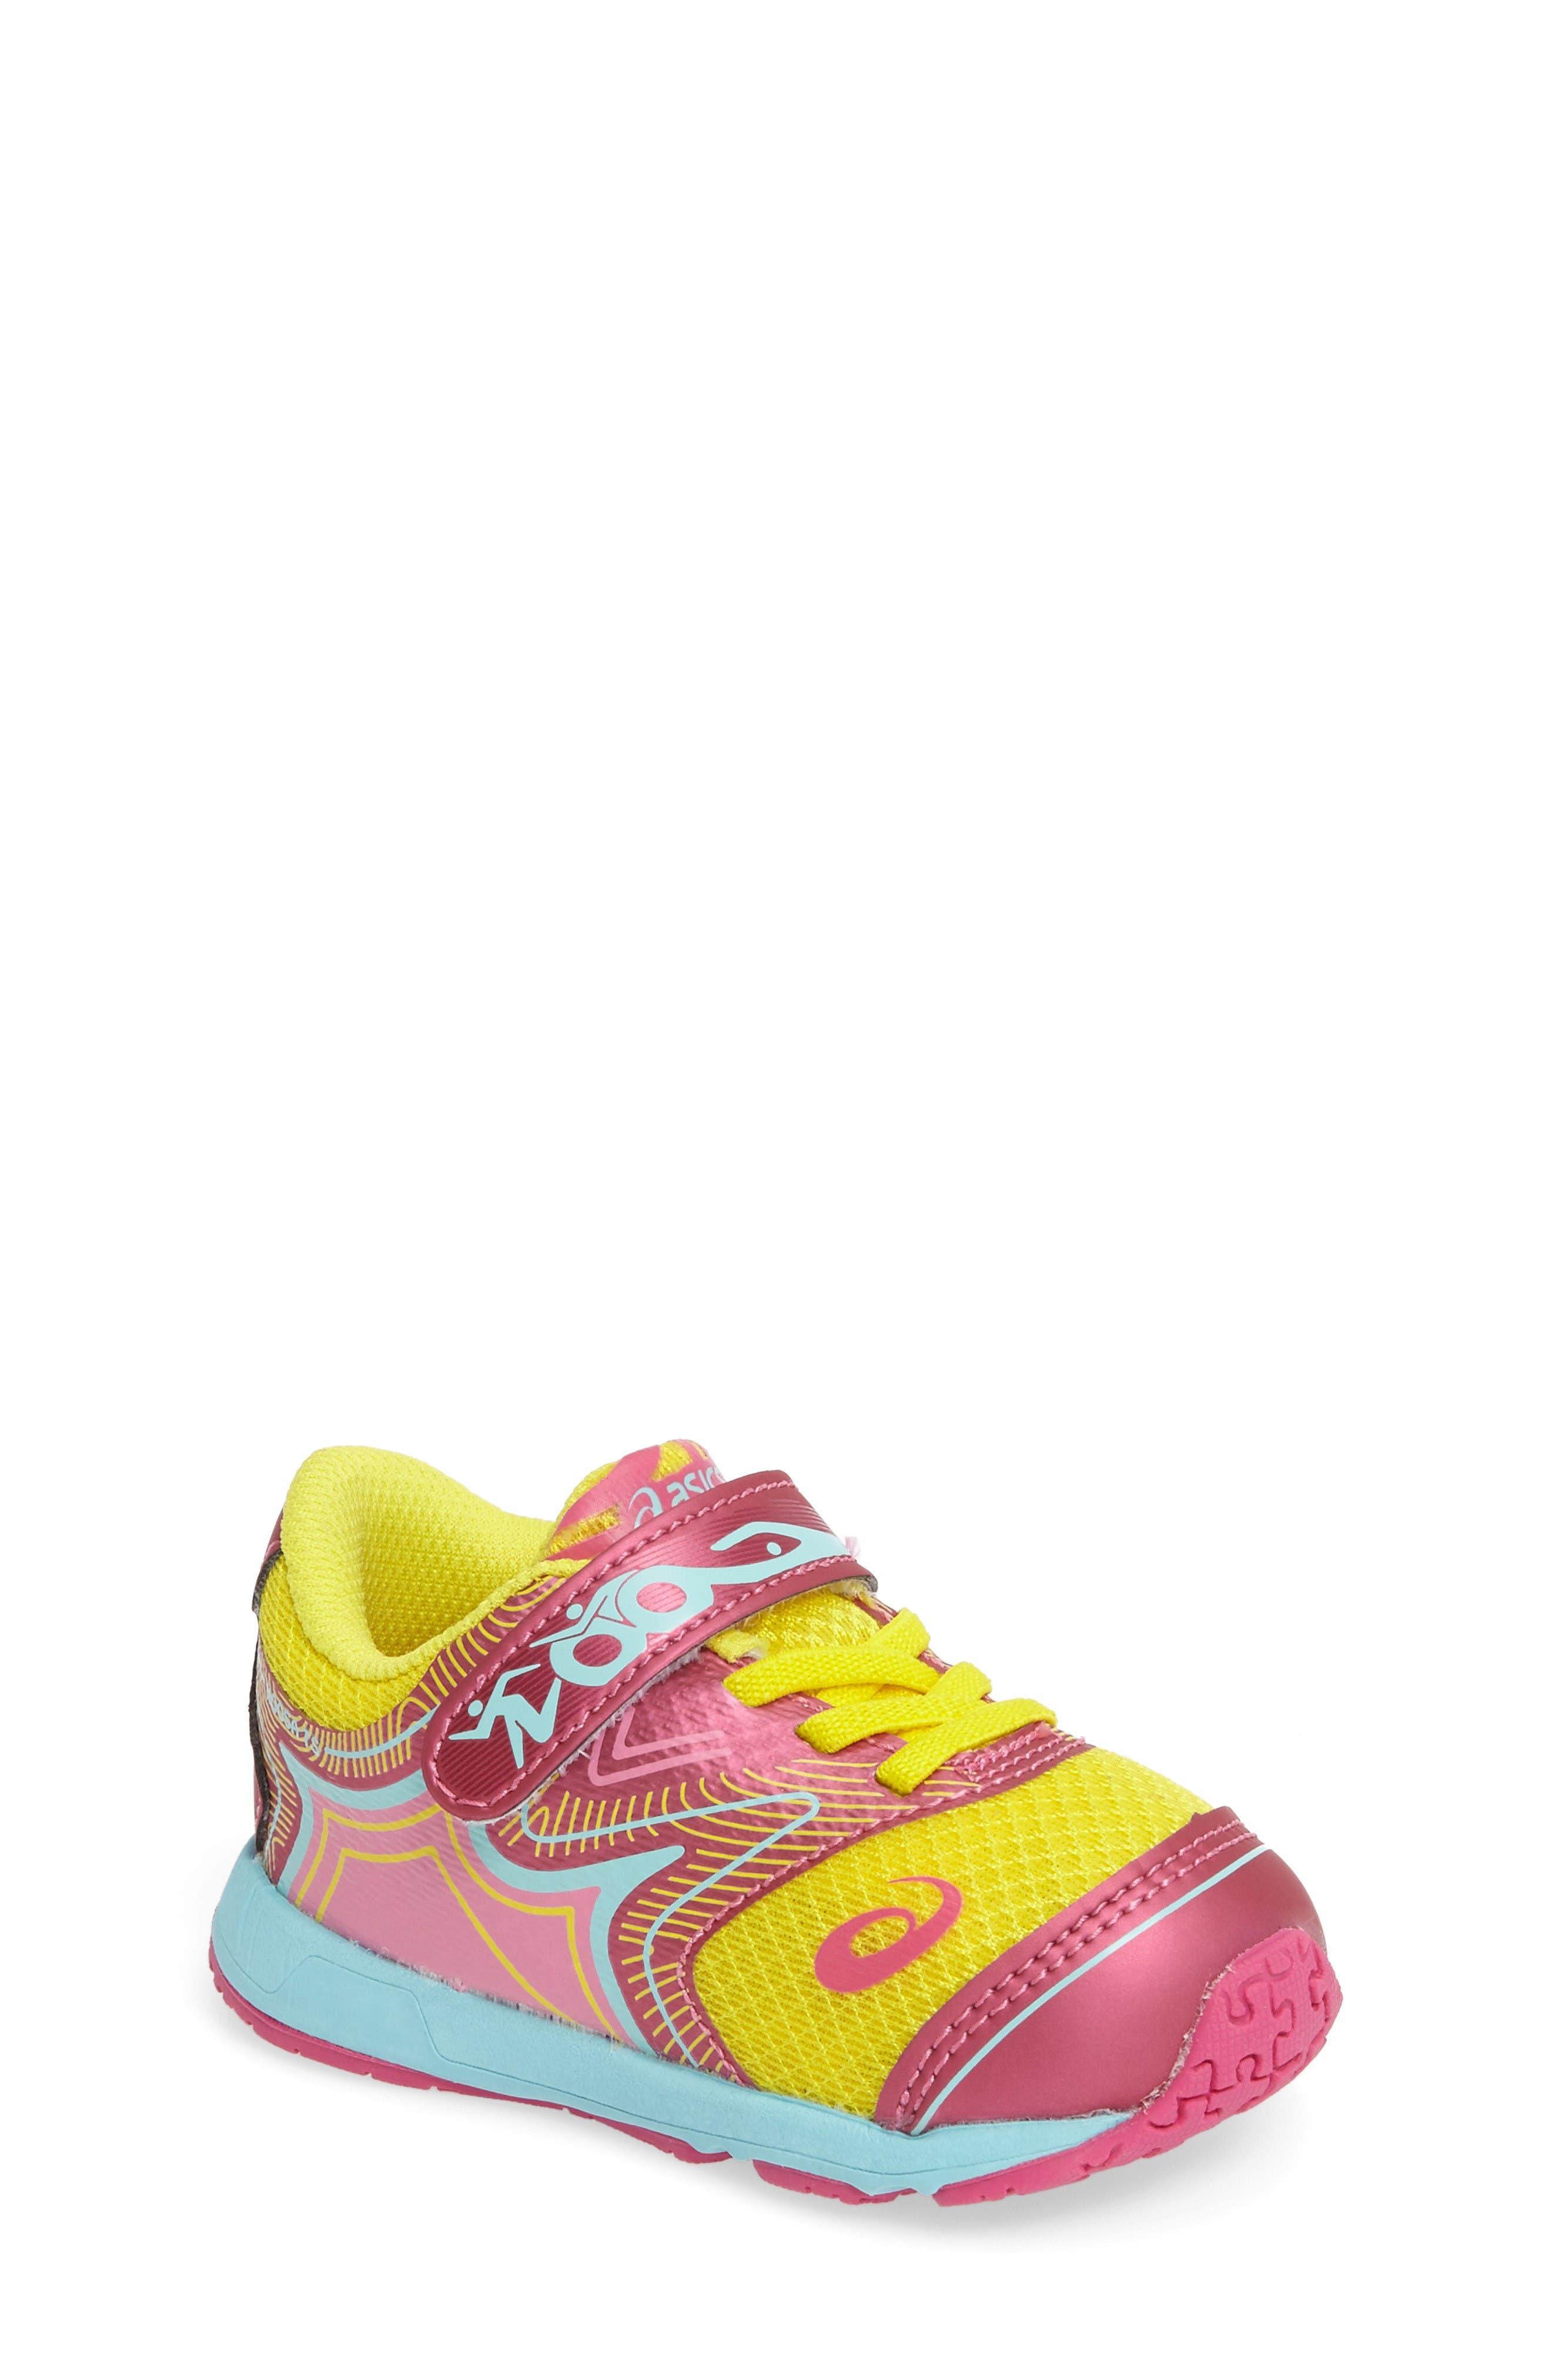 ASICS<SUP>®</SUP> Noosa TS Sneaker